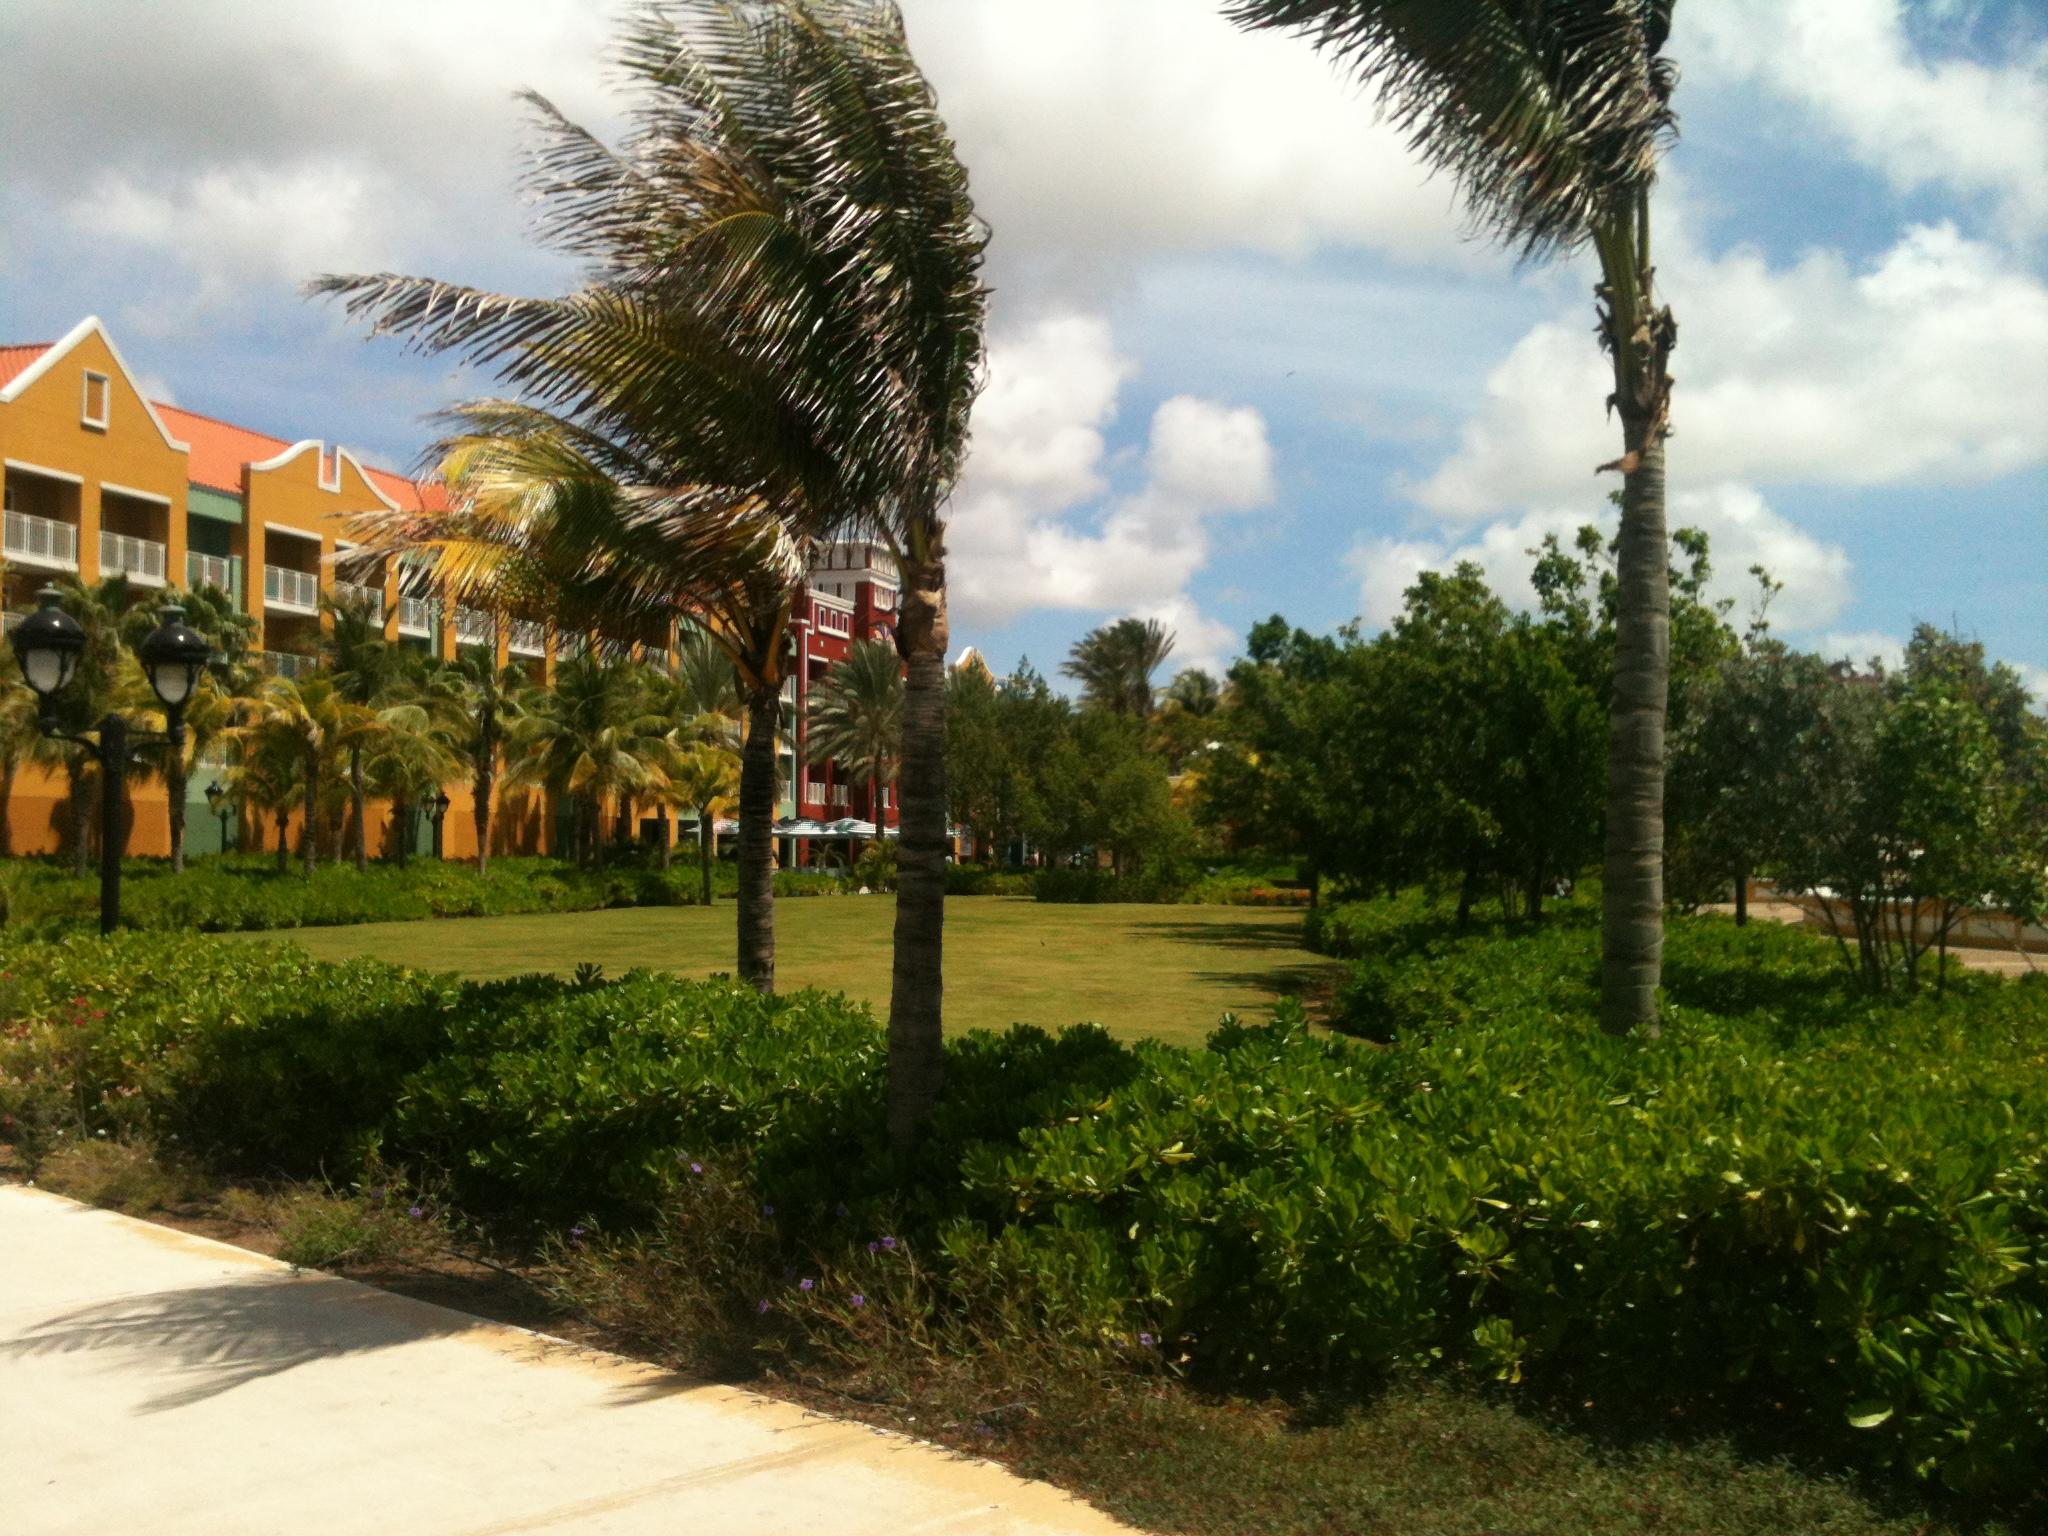 Renaissance hotel garden